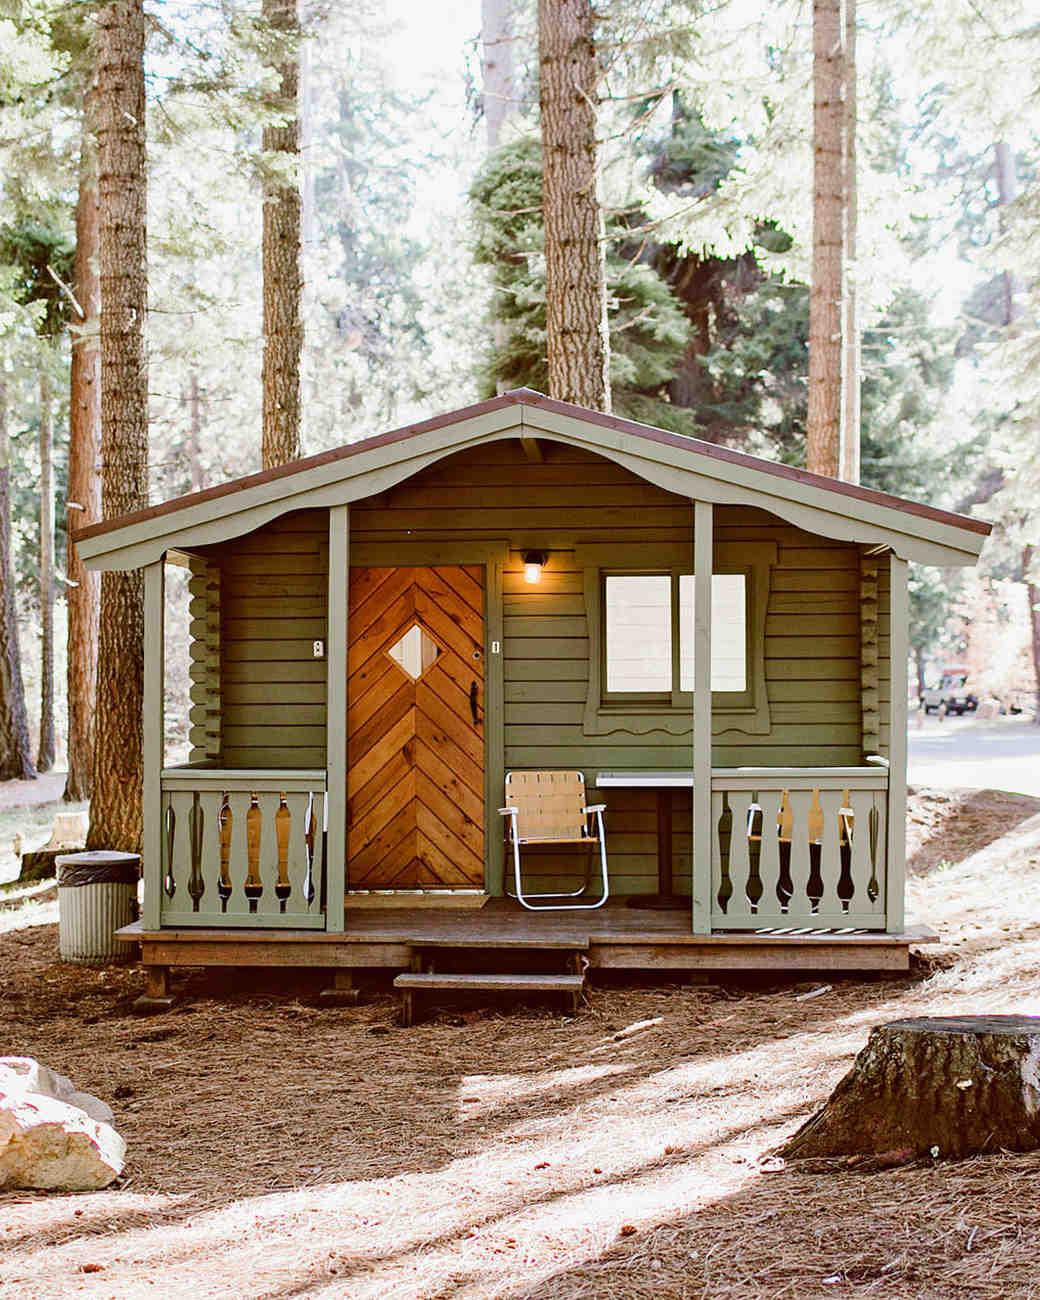 Wedding Tent Rentals Portland Oregon: 18 Summer Camp Wedding Venues For Kicking Back And Getting